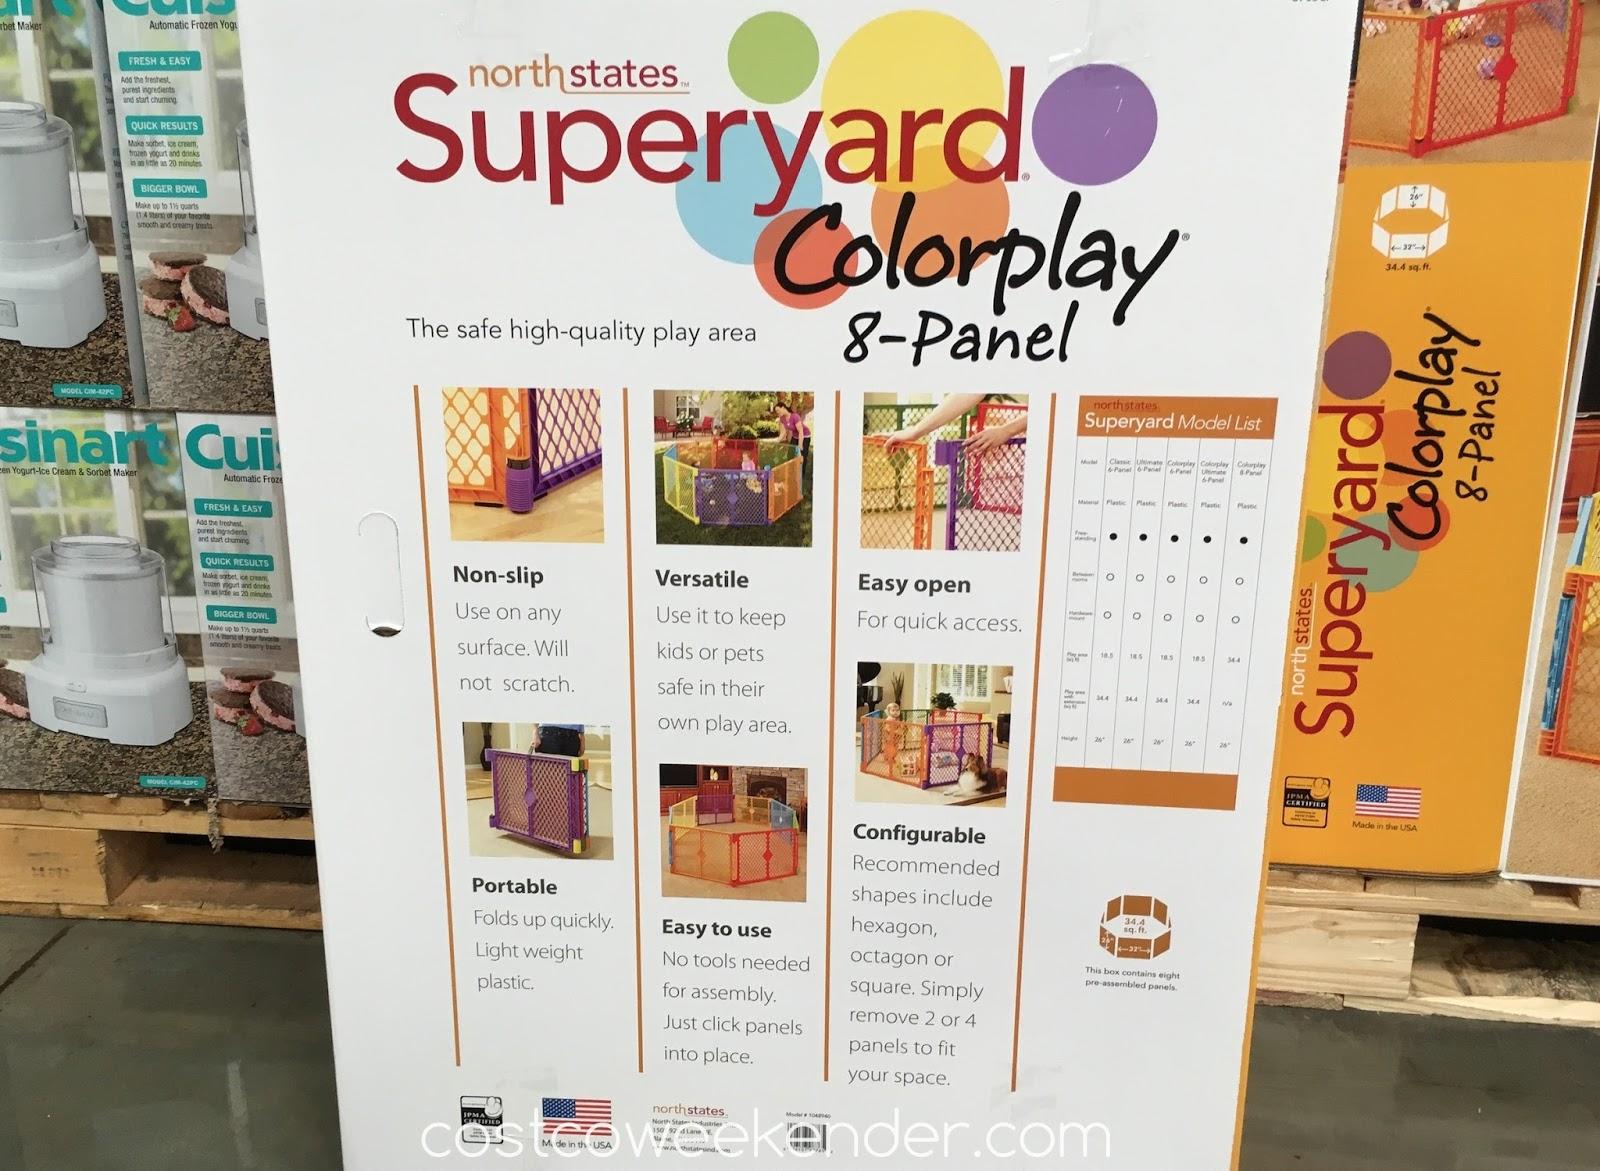 North States Superyard Colorplay 8 Panel Play Yard